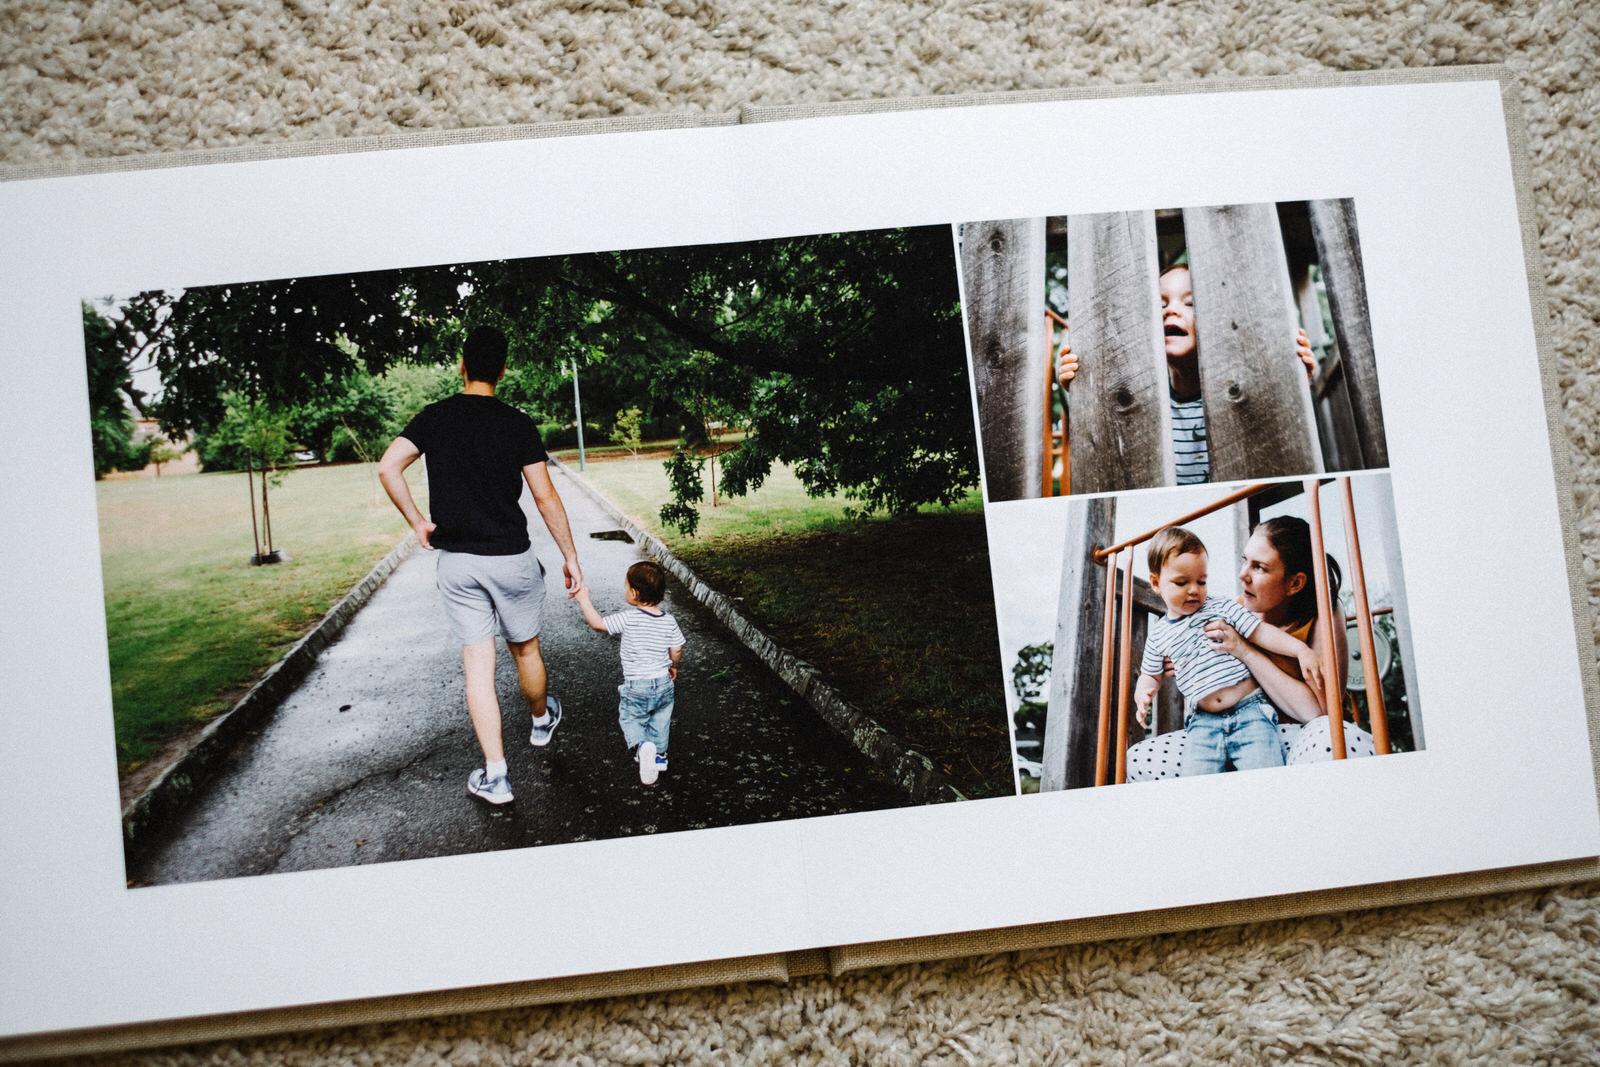 family-story-photos-photo-album-06.jpg